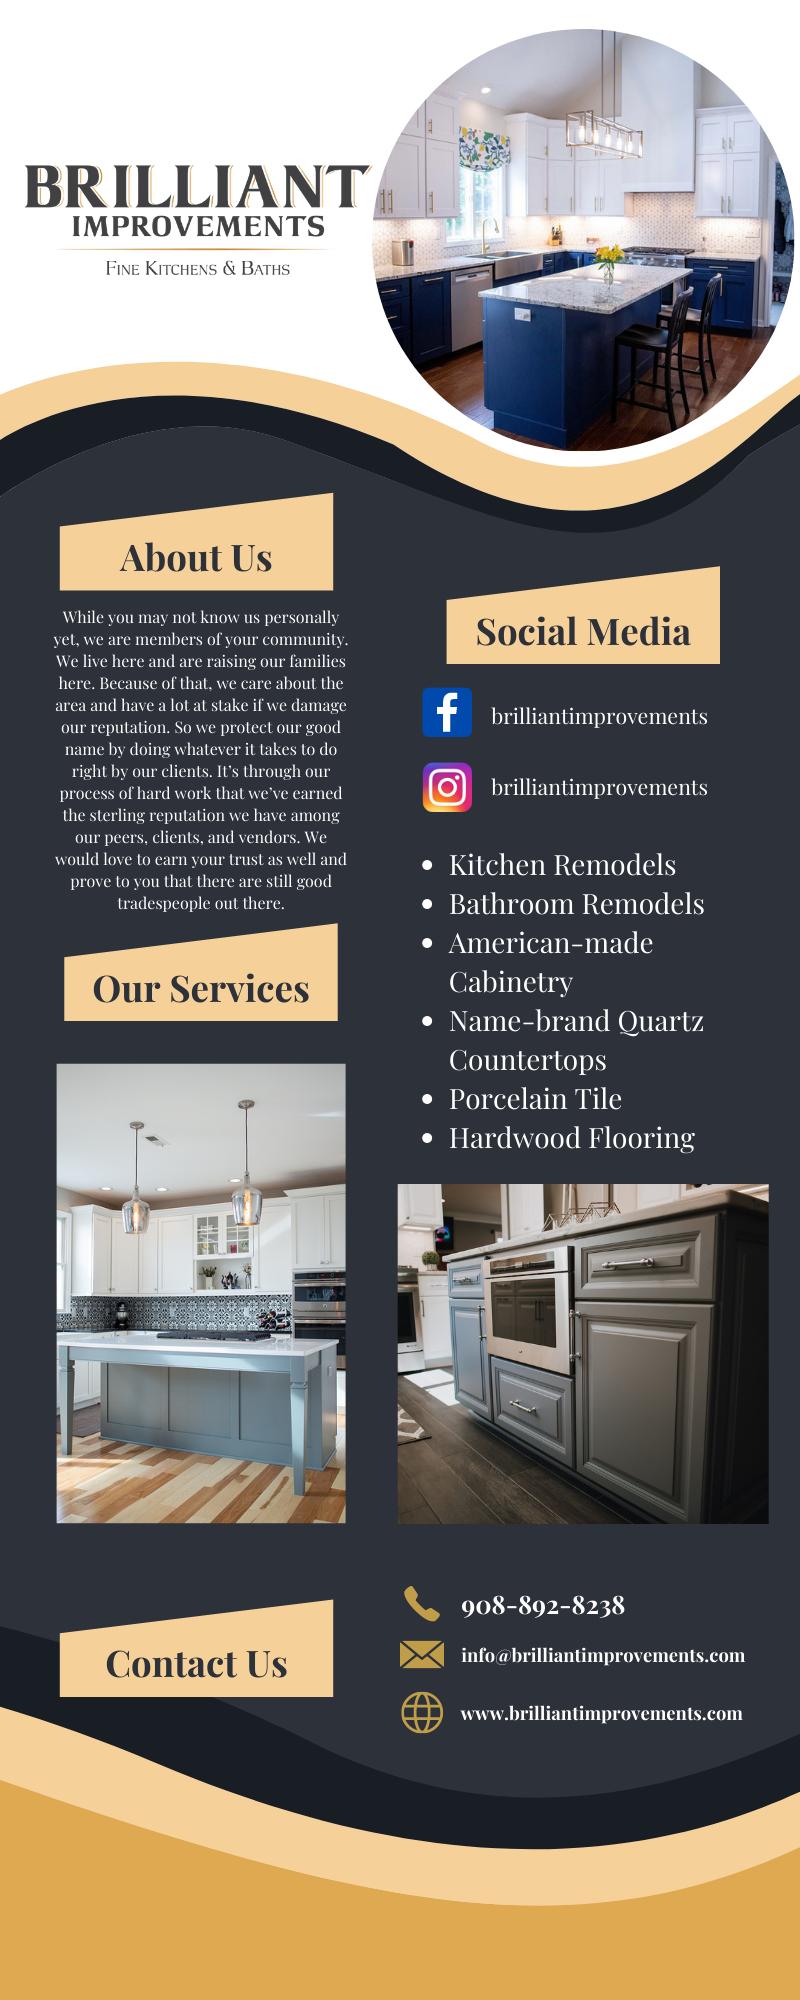 Fine Kitchens and Baths 3